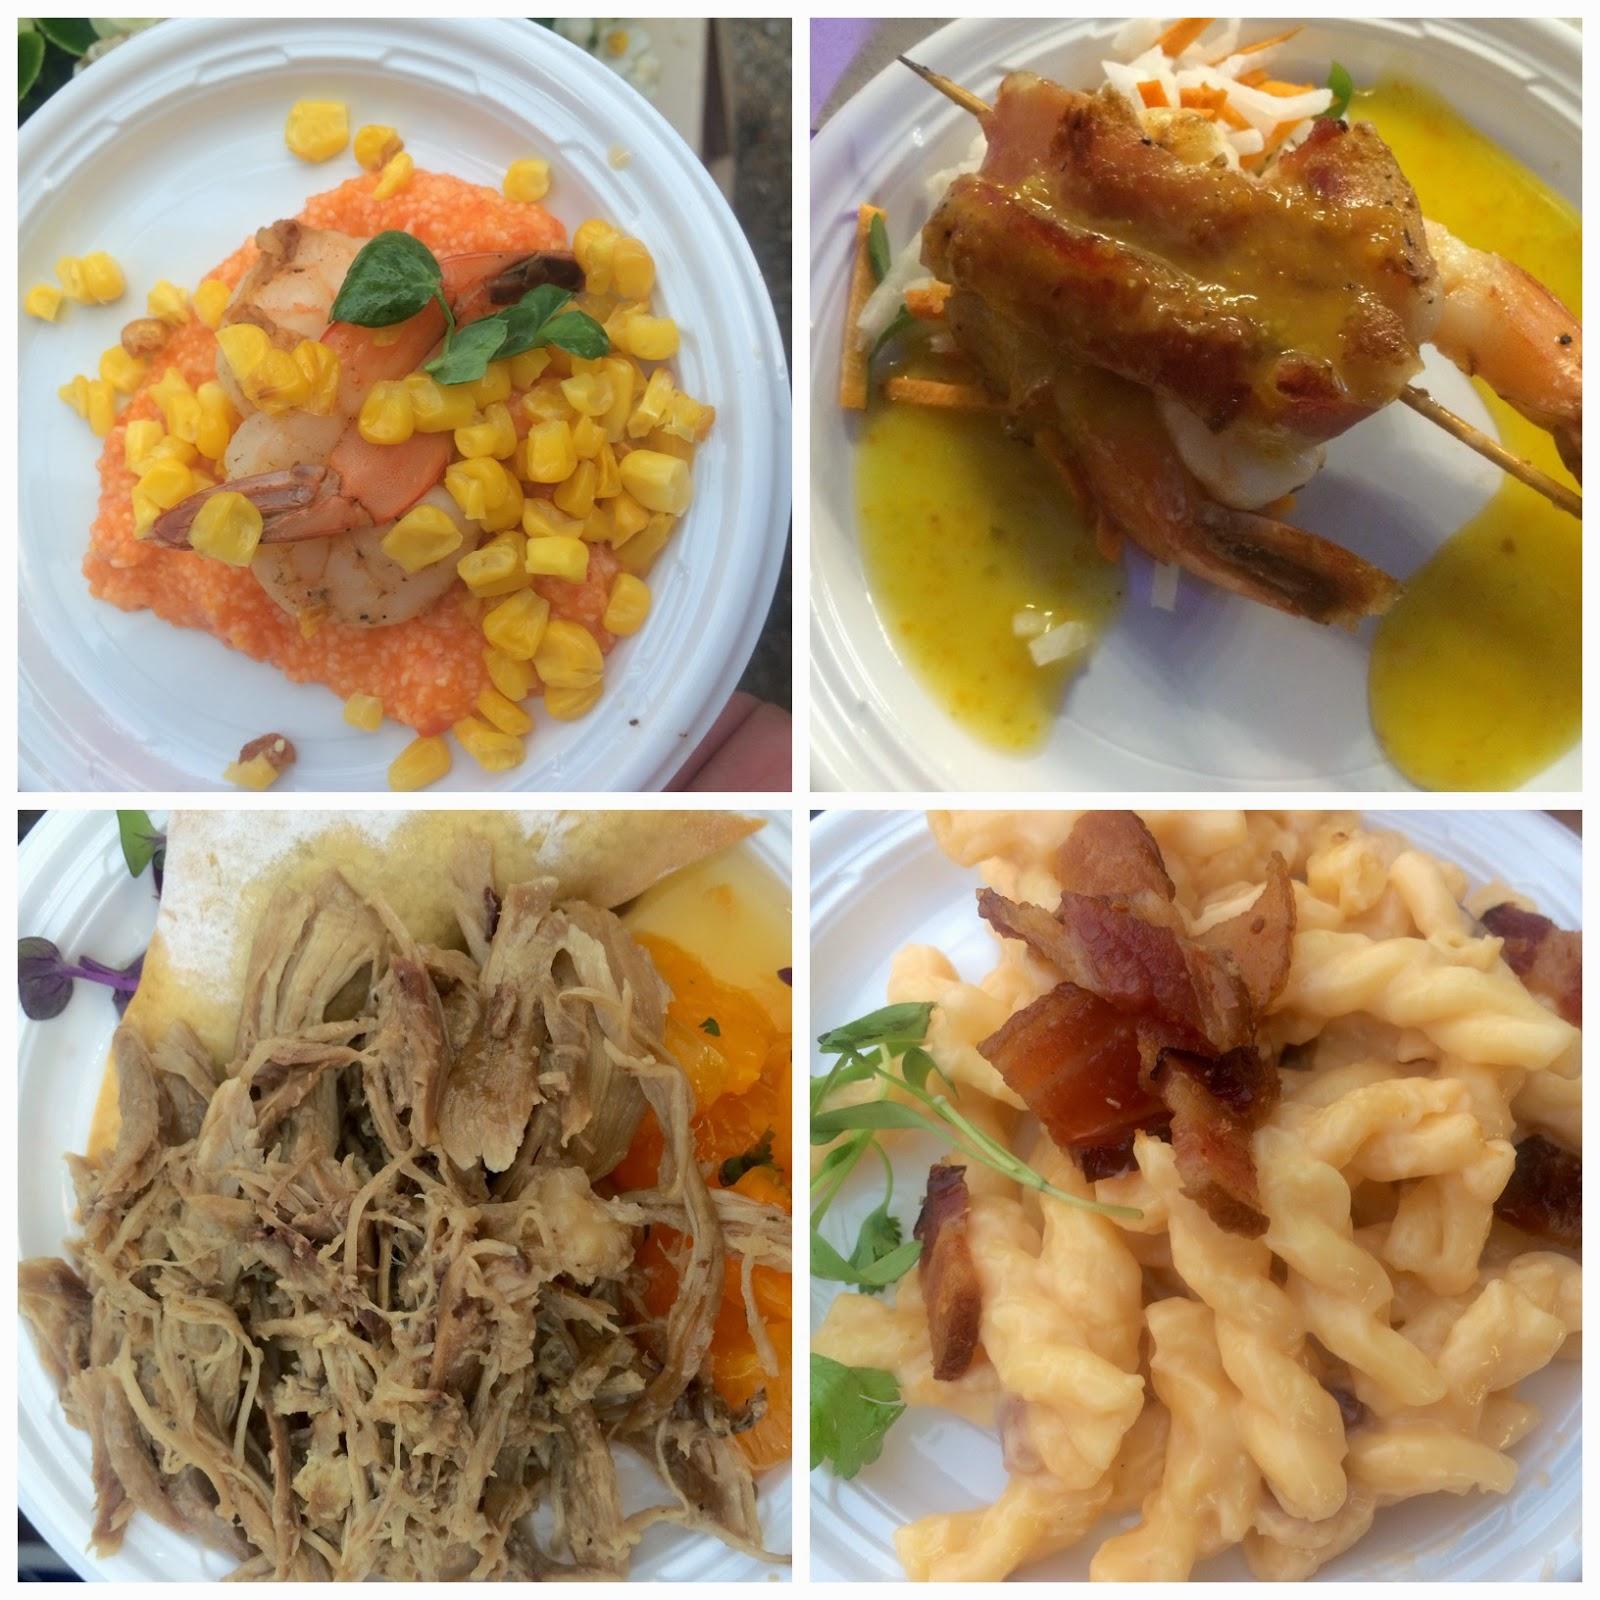 Busch Gardens Food & Wine Festival - Martinis | Bikinis